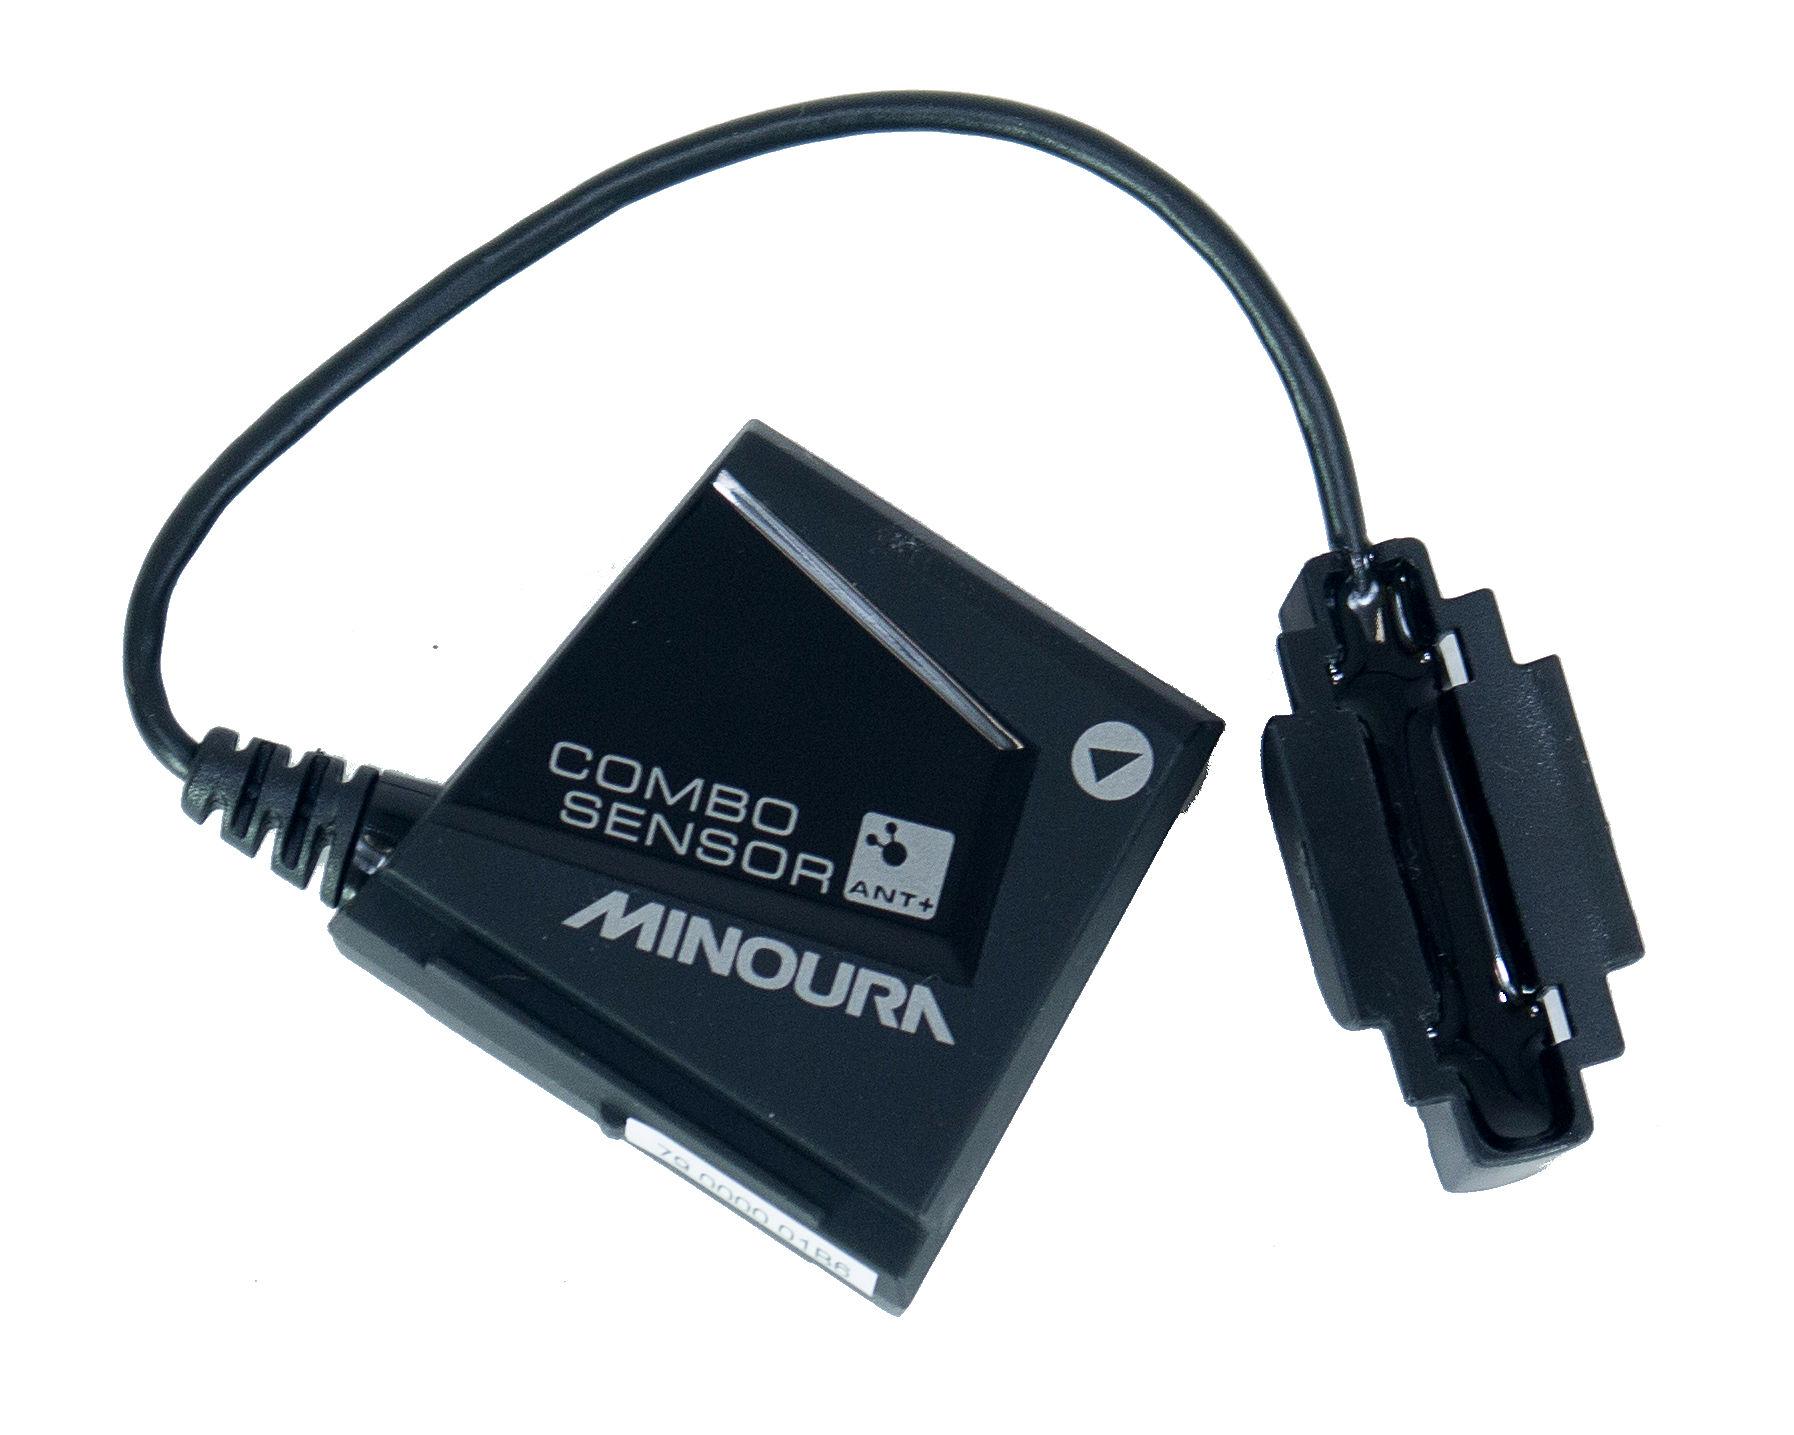 Minoura ANT+ Live Training Speed/Cadence Sensor